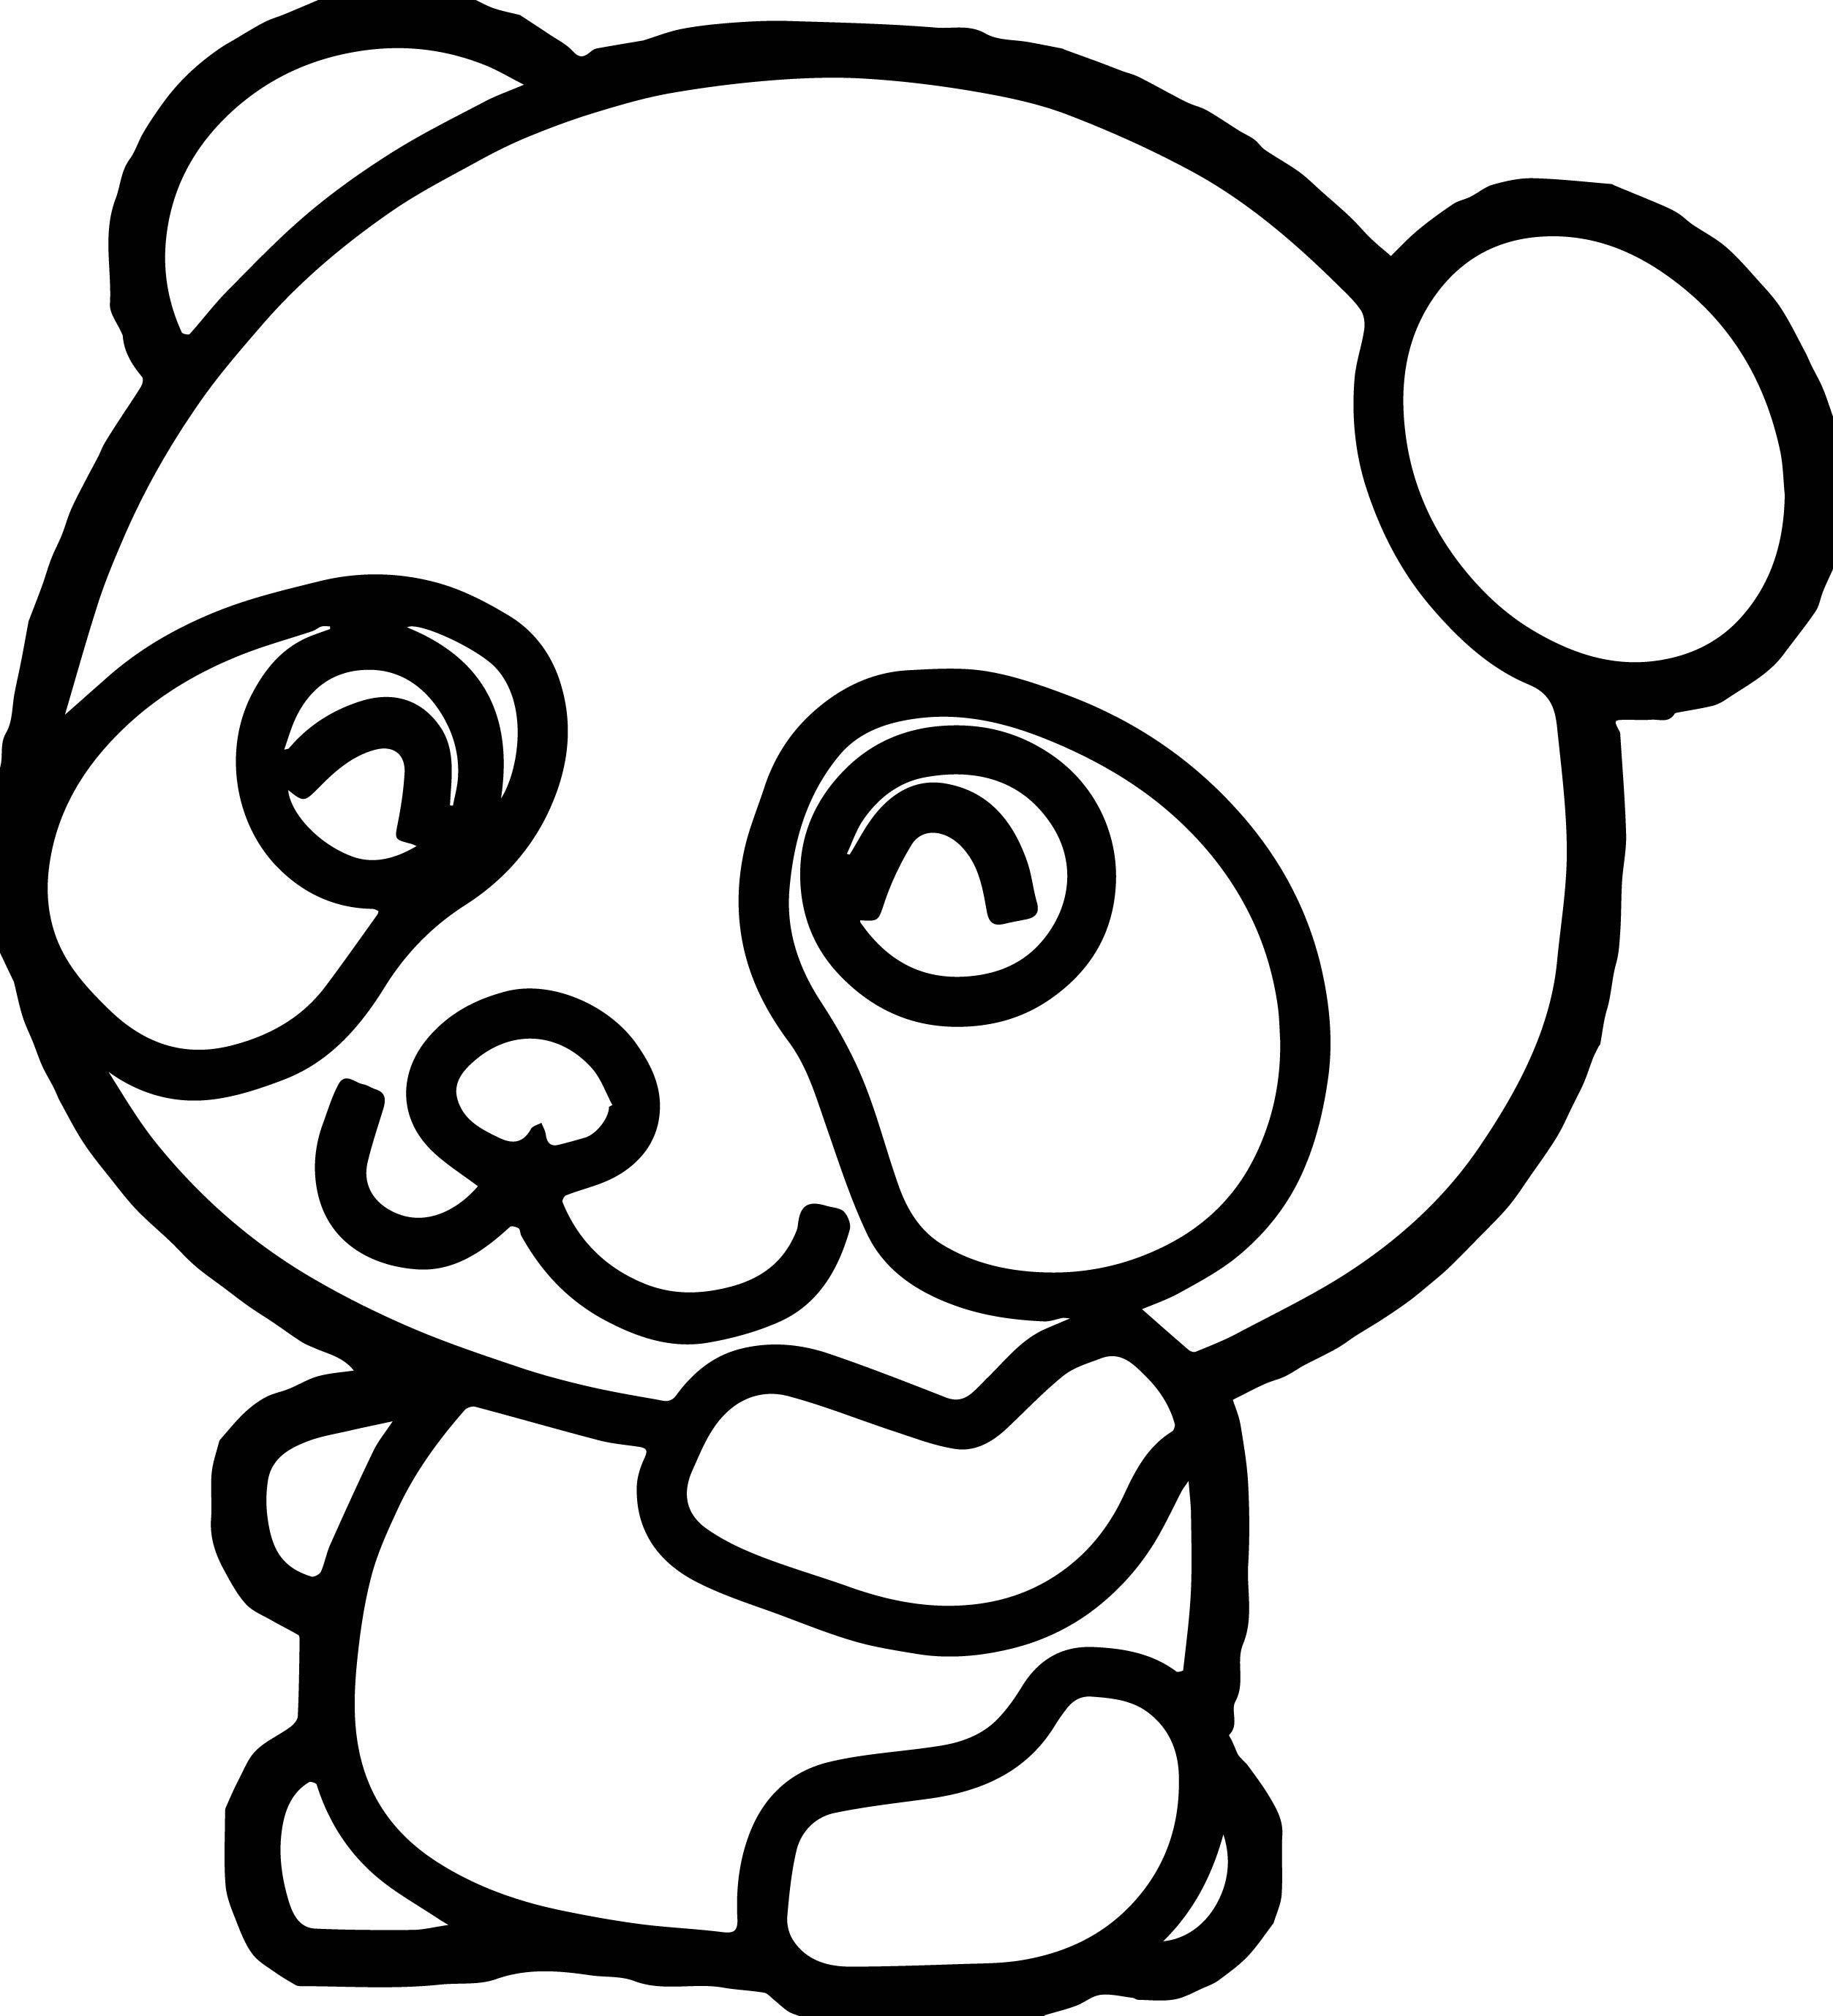 Cool Cute Kung Fu Panda Coloring Page Panda Coloring Pages Emoji Coloring Pages Monster Coloring Pages